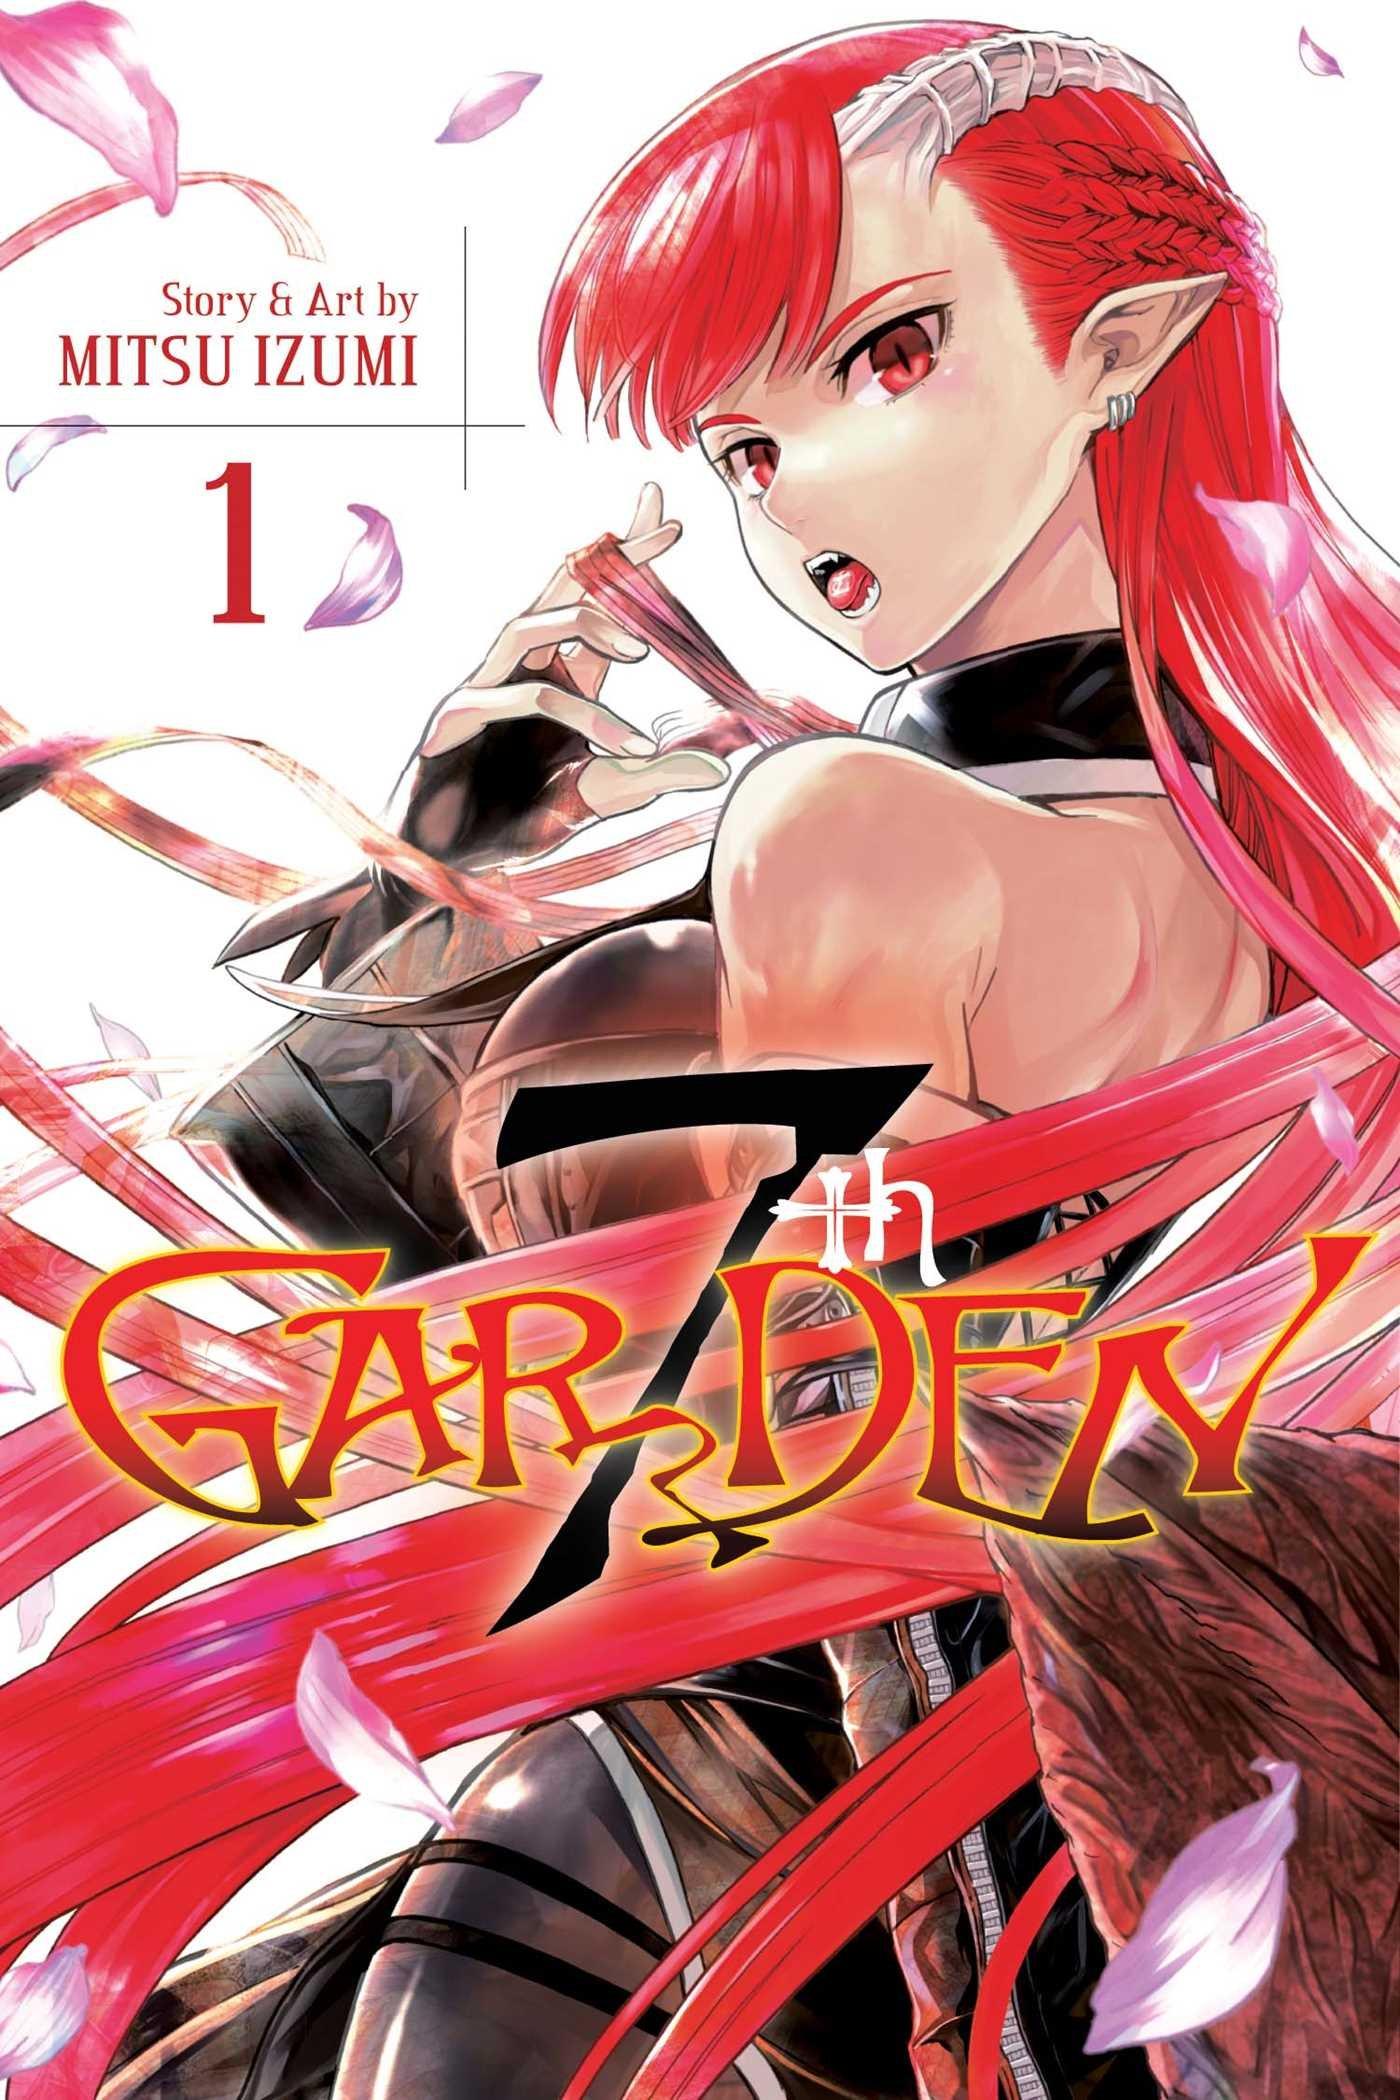 7th Garden, Vol. 1 ebook